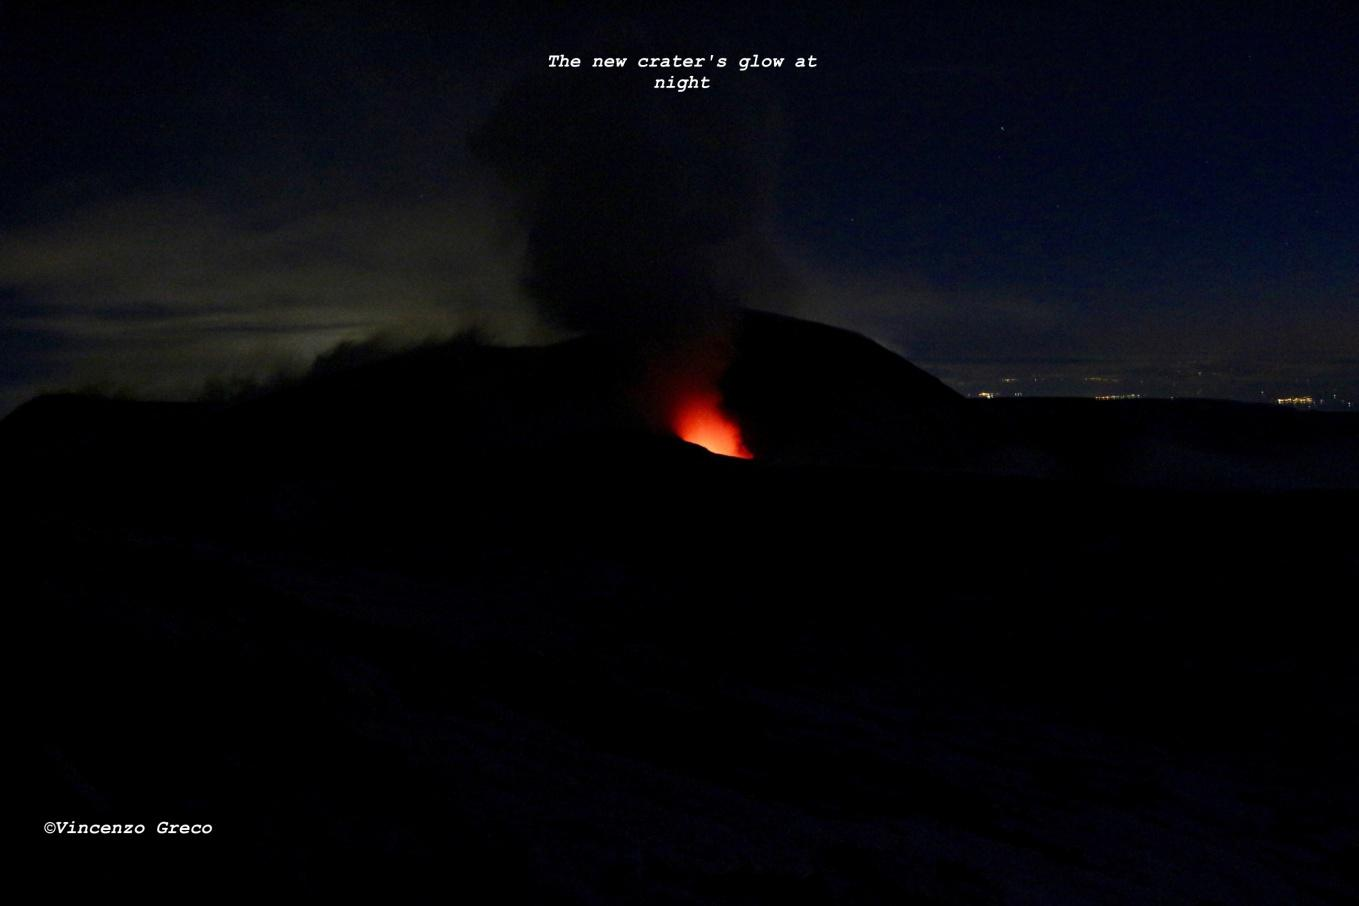 Guide Vulcanologiche Etna - Storia geologica dell'Etna